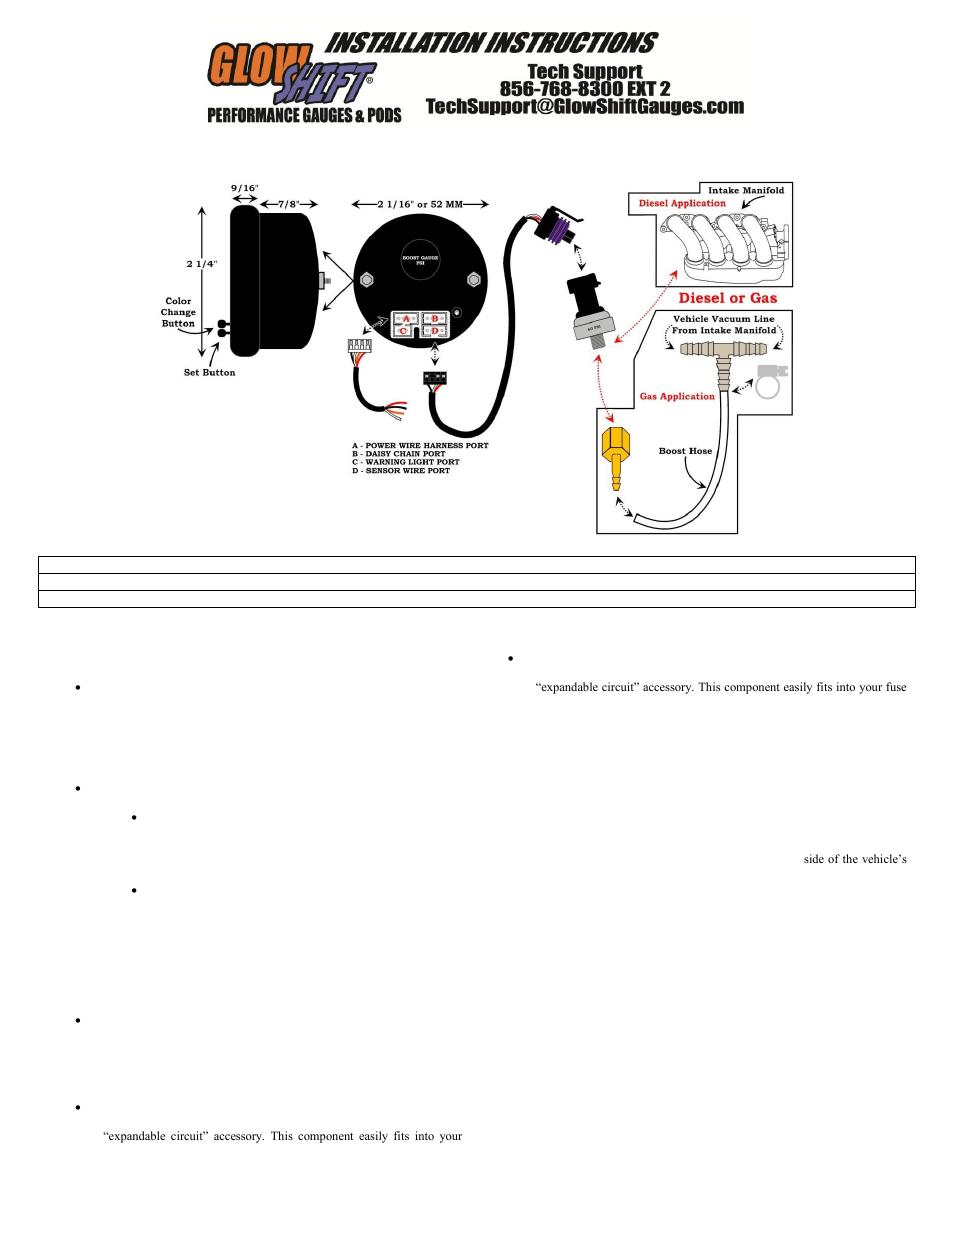 ashcroft pressure transducer wiring diagram goldstar gps glowshift boost gauge big bear 400 schematic jvc kd-r210 aftermarket ...